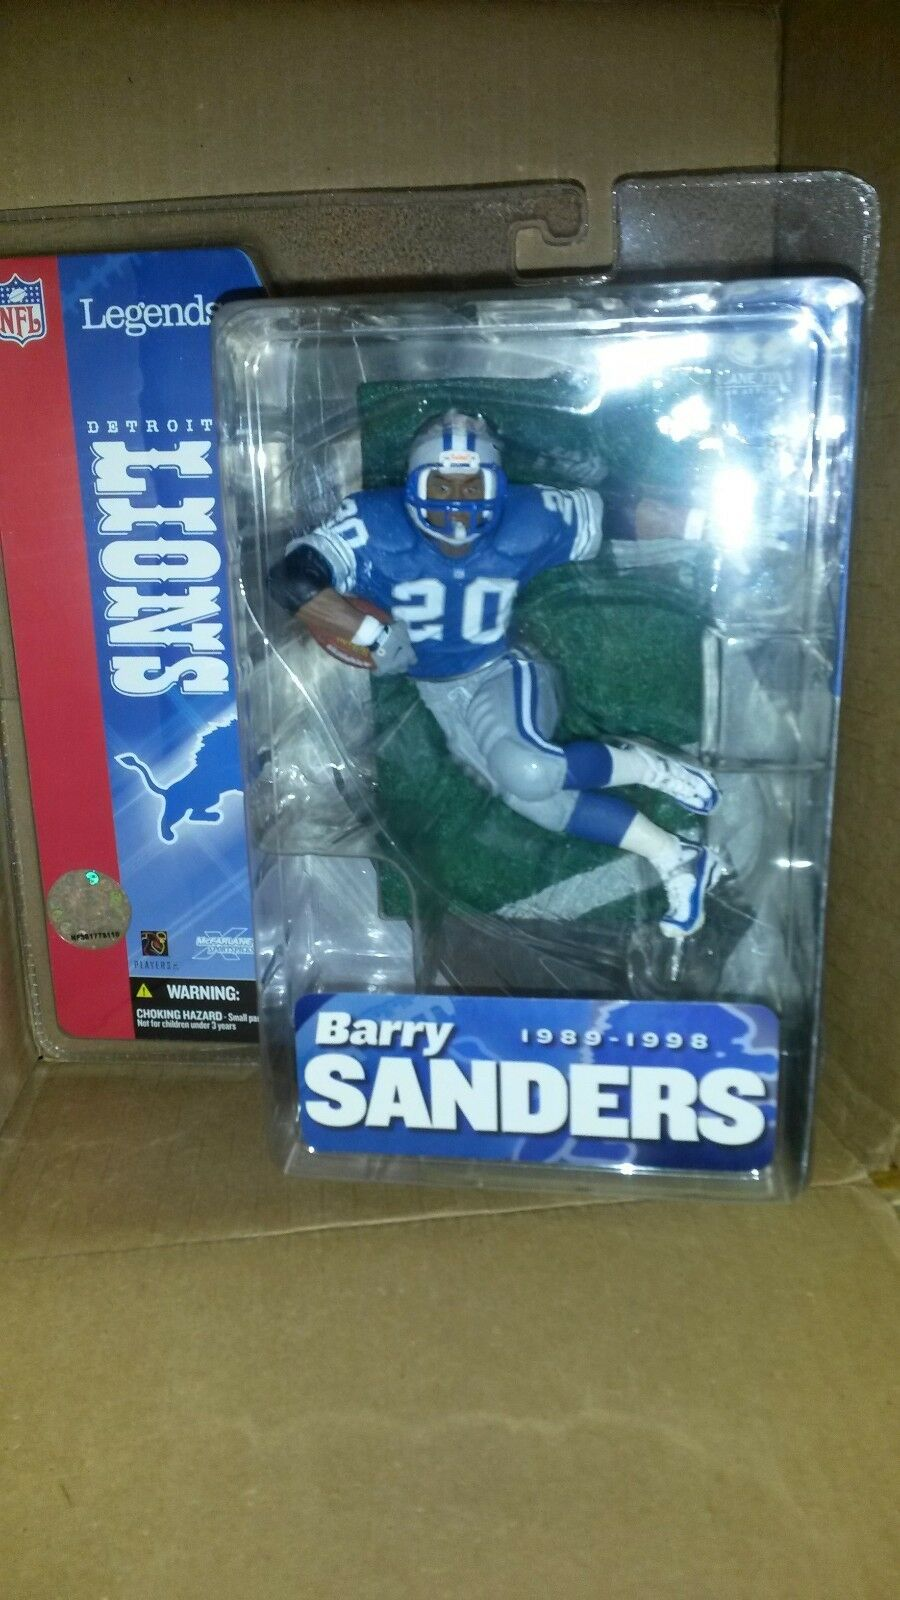 McFarlane NFL LEGENDS BARRY SANDERS DETROIT DETROIT DETROIT LIONS blueE JERSEY NEW IN BOX 23ede1